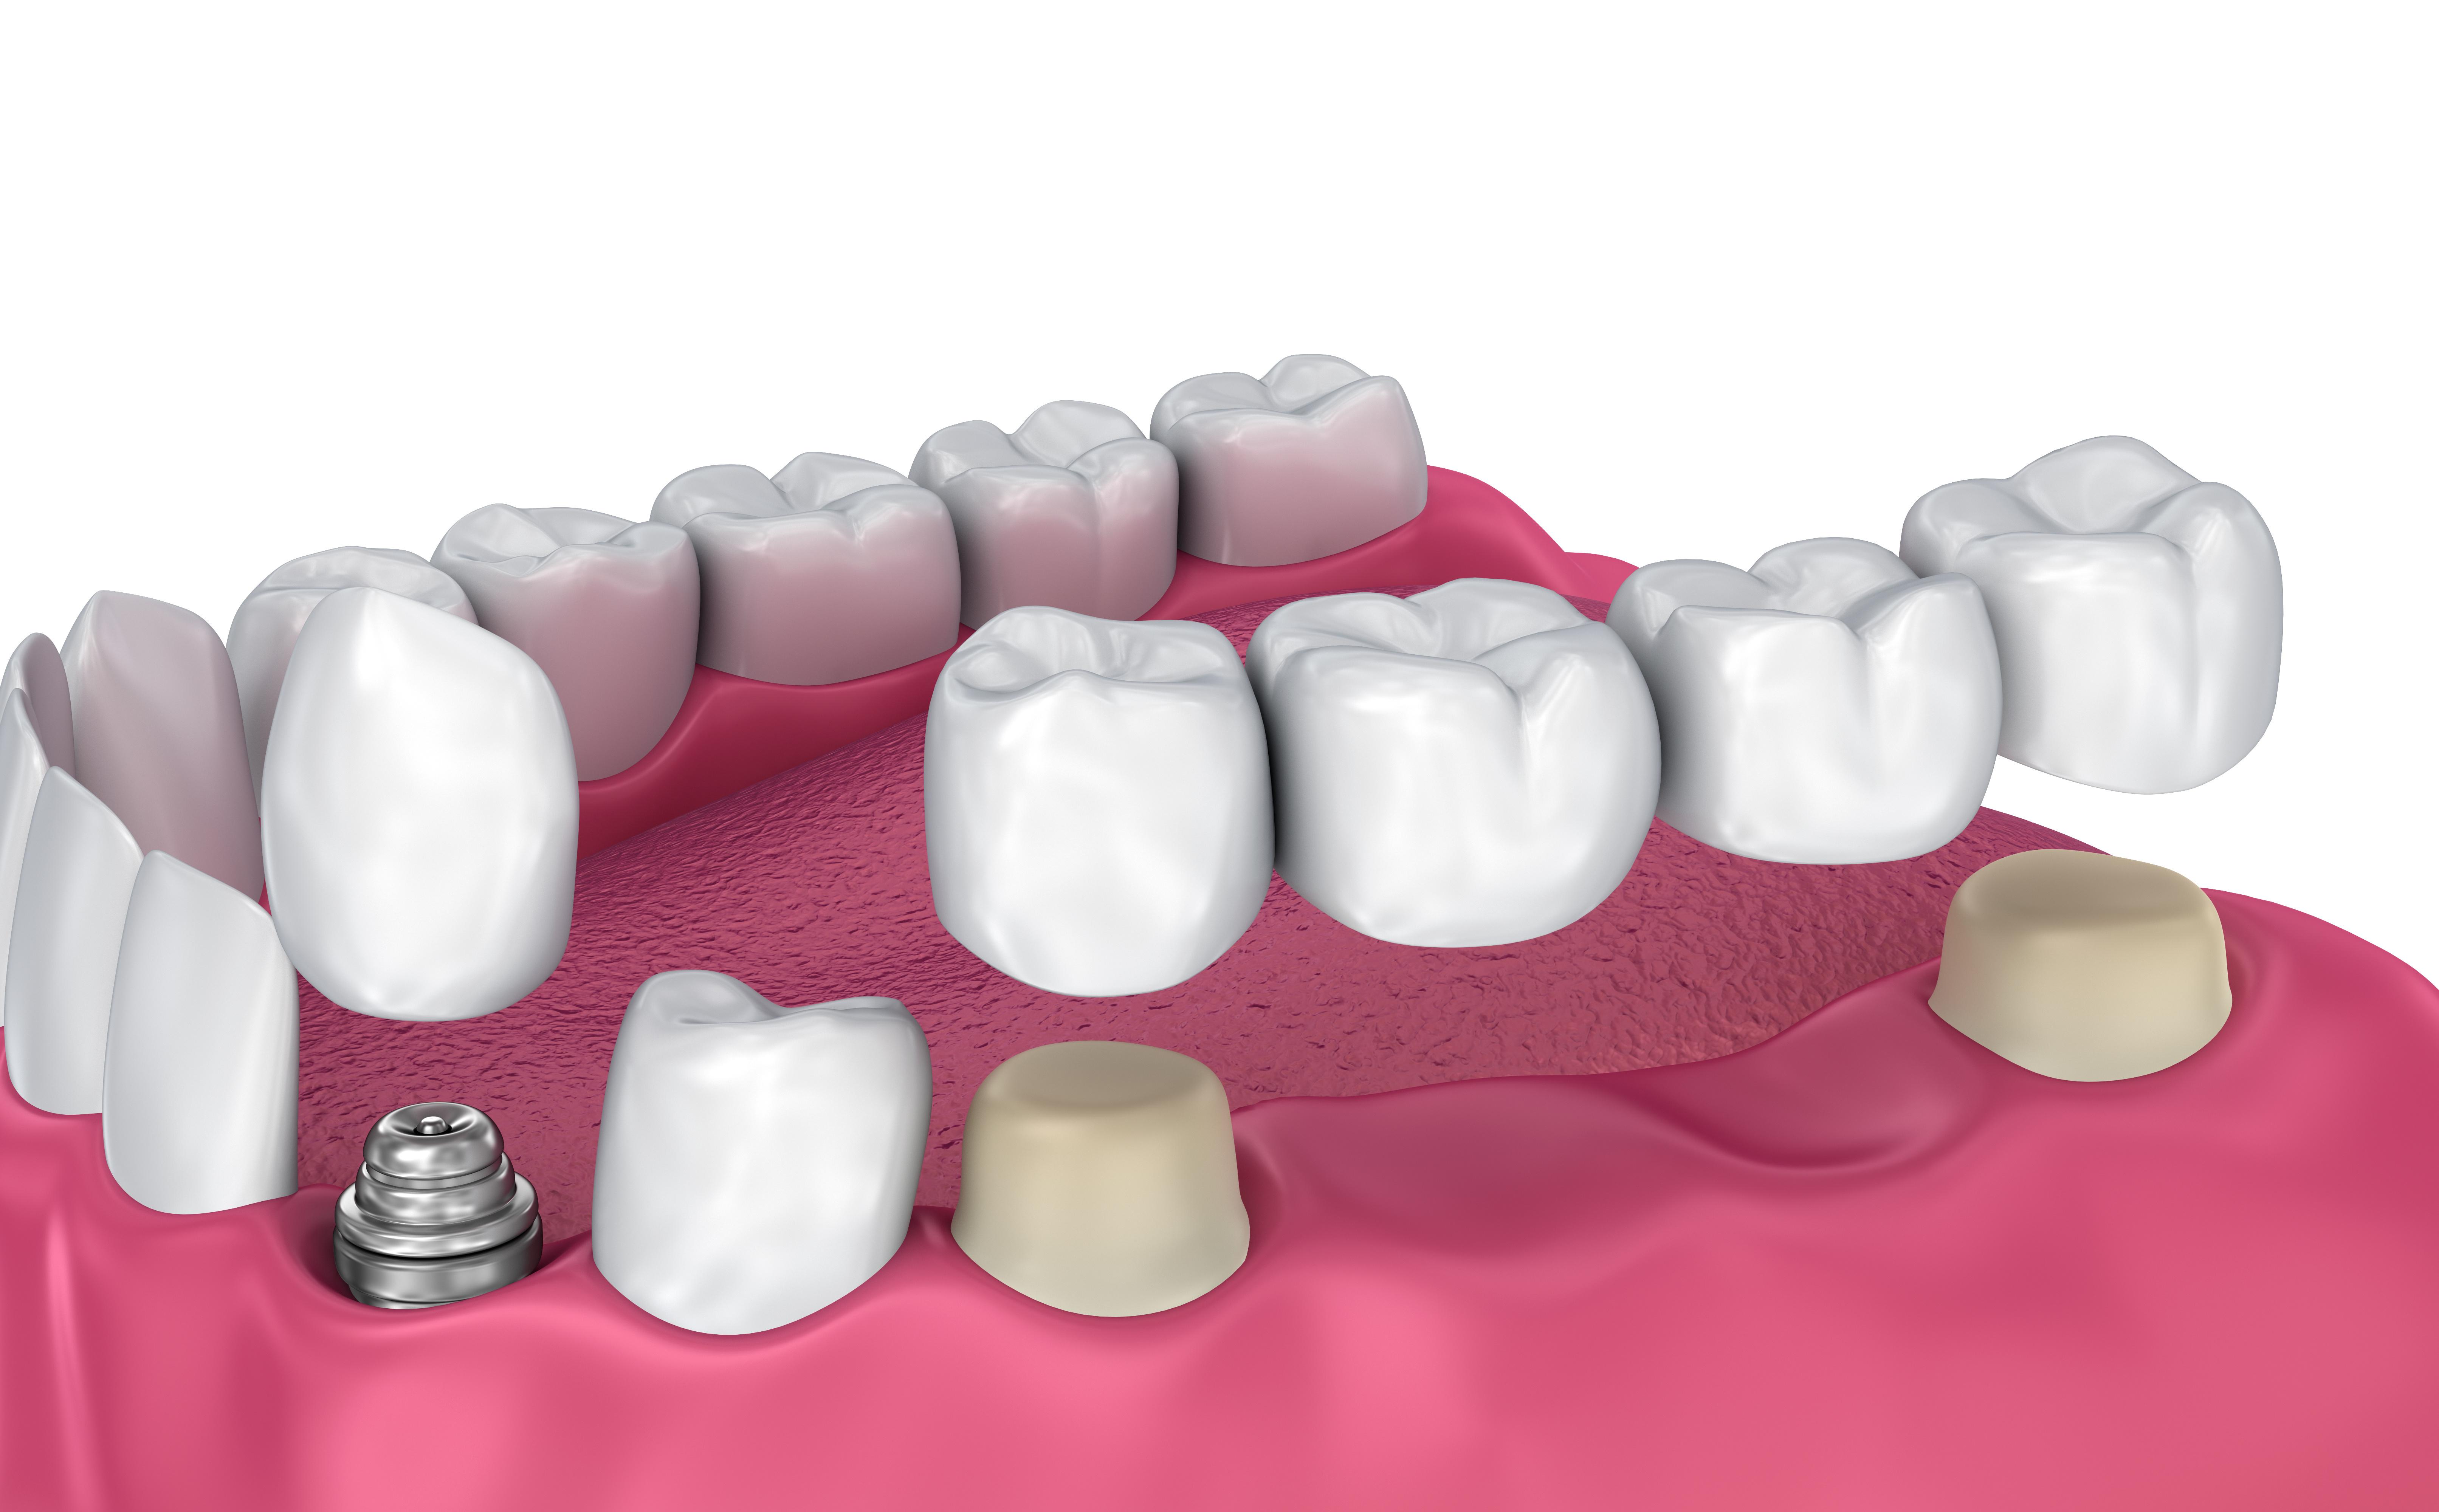 prótesis dental en Clínica Dental Roca Santiago - Fuengirola - Málaga